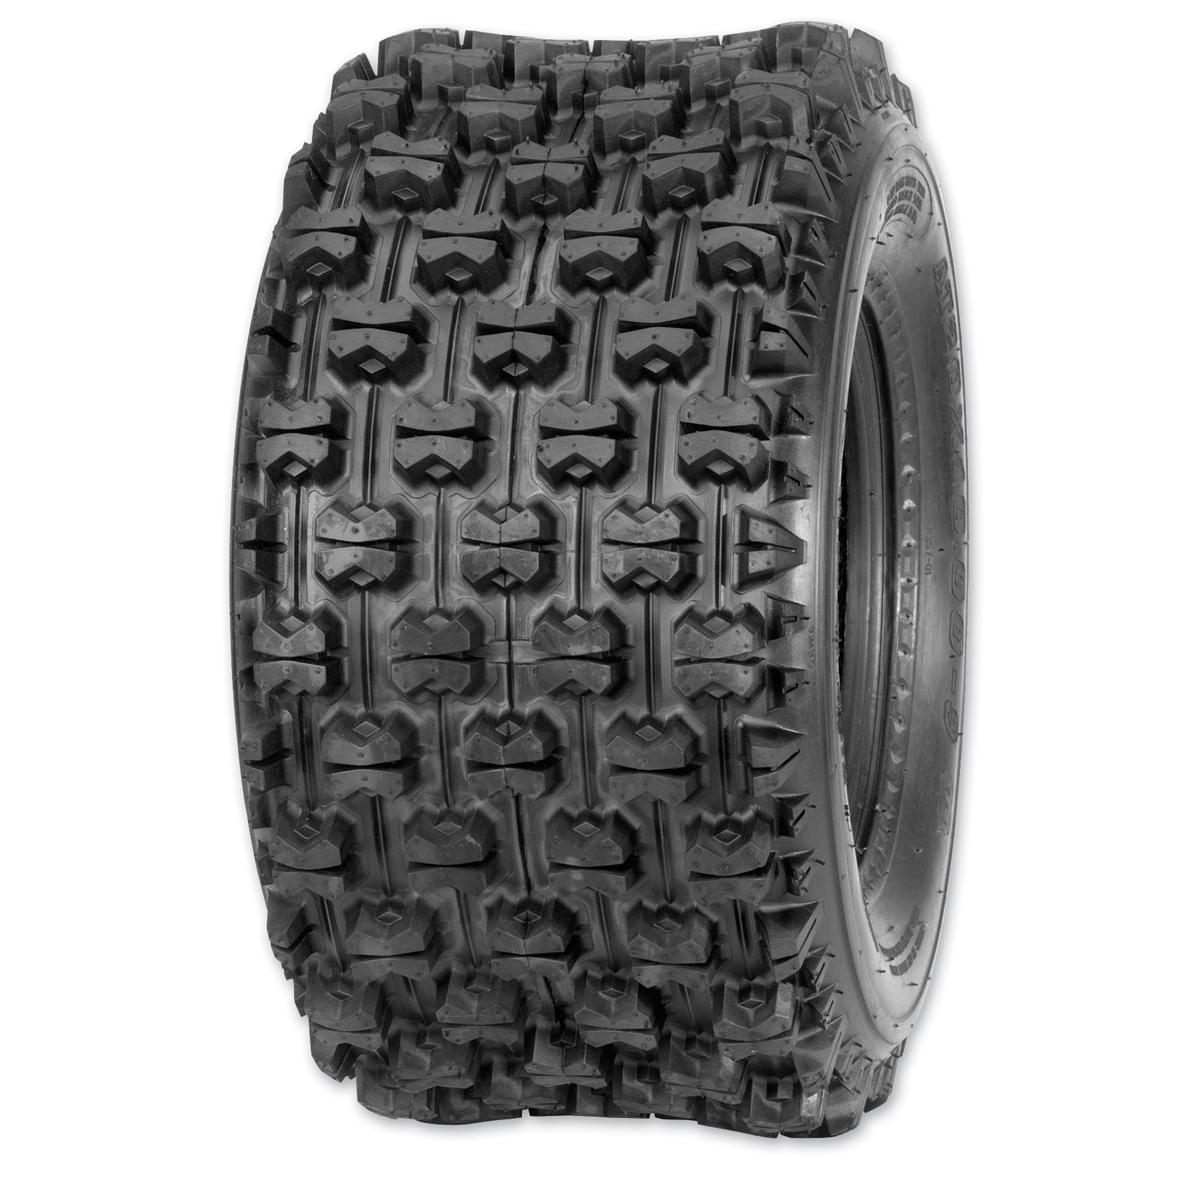 Quadboss QBT739 20X11-9 4-Ply Rear Tire